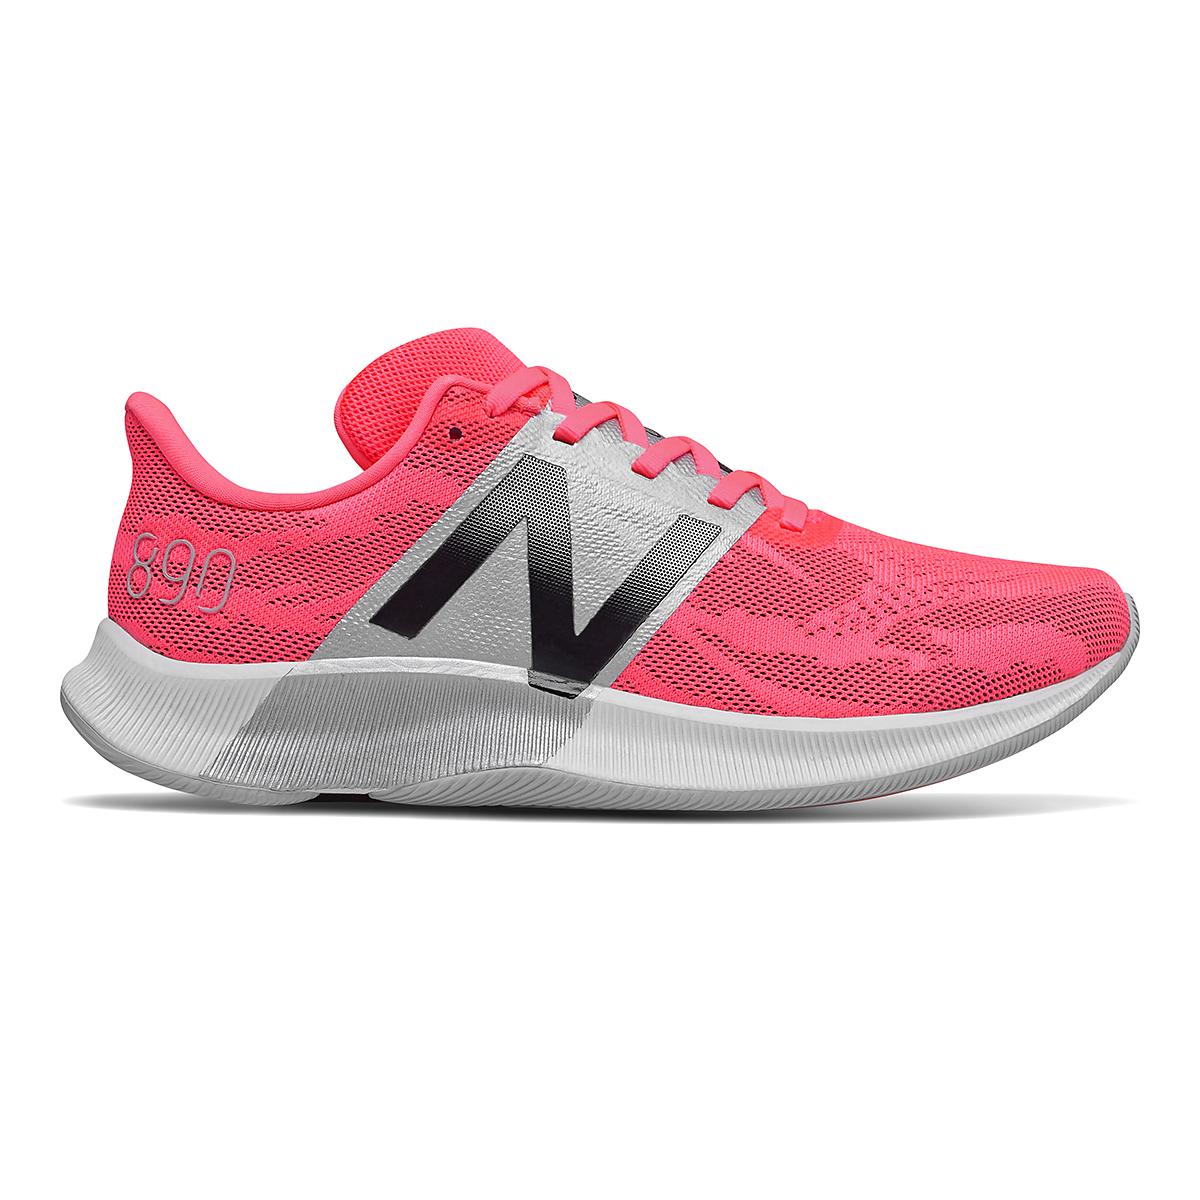 Women's New Balance 890V8 Running Shoe - Color: Guava - Size: 7 - Width: Regular, Guava, large, image 1